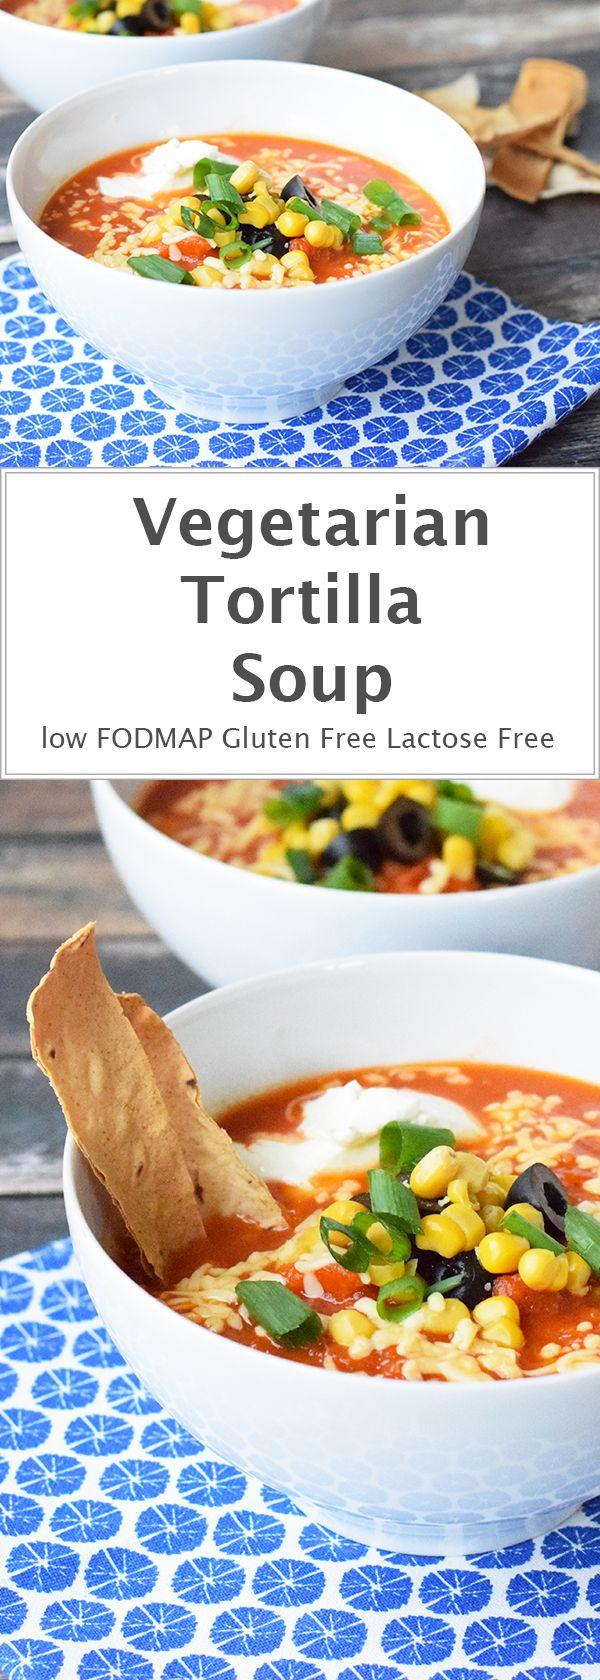 ... Vegetarian Tortilla Soup on Pinterest | Soups, Tortillas and Soup